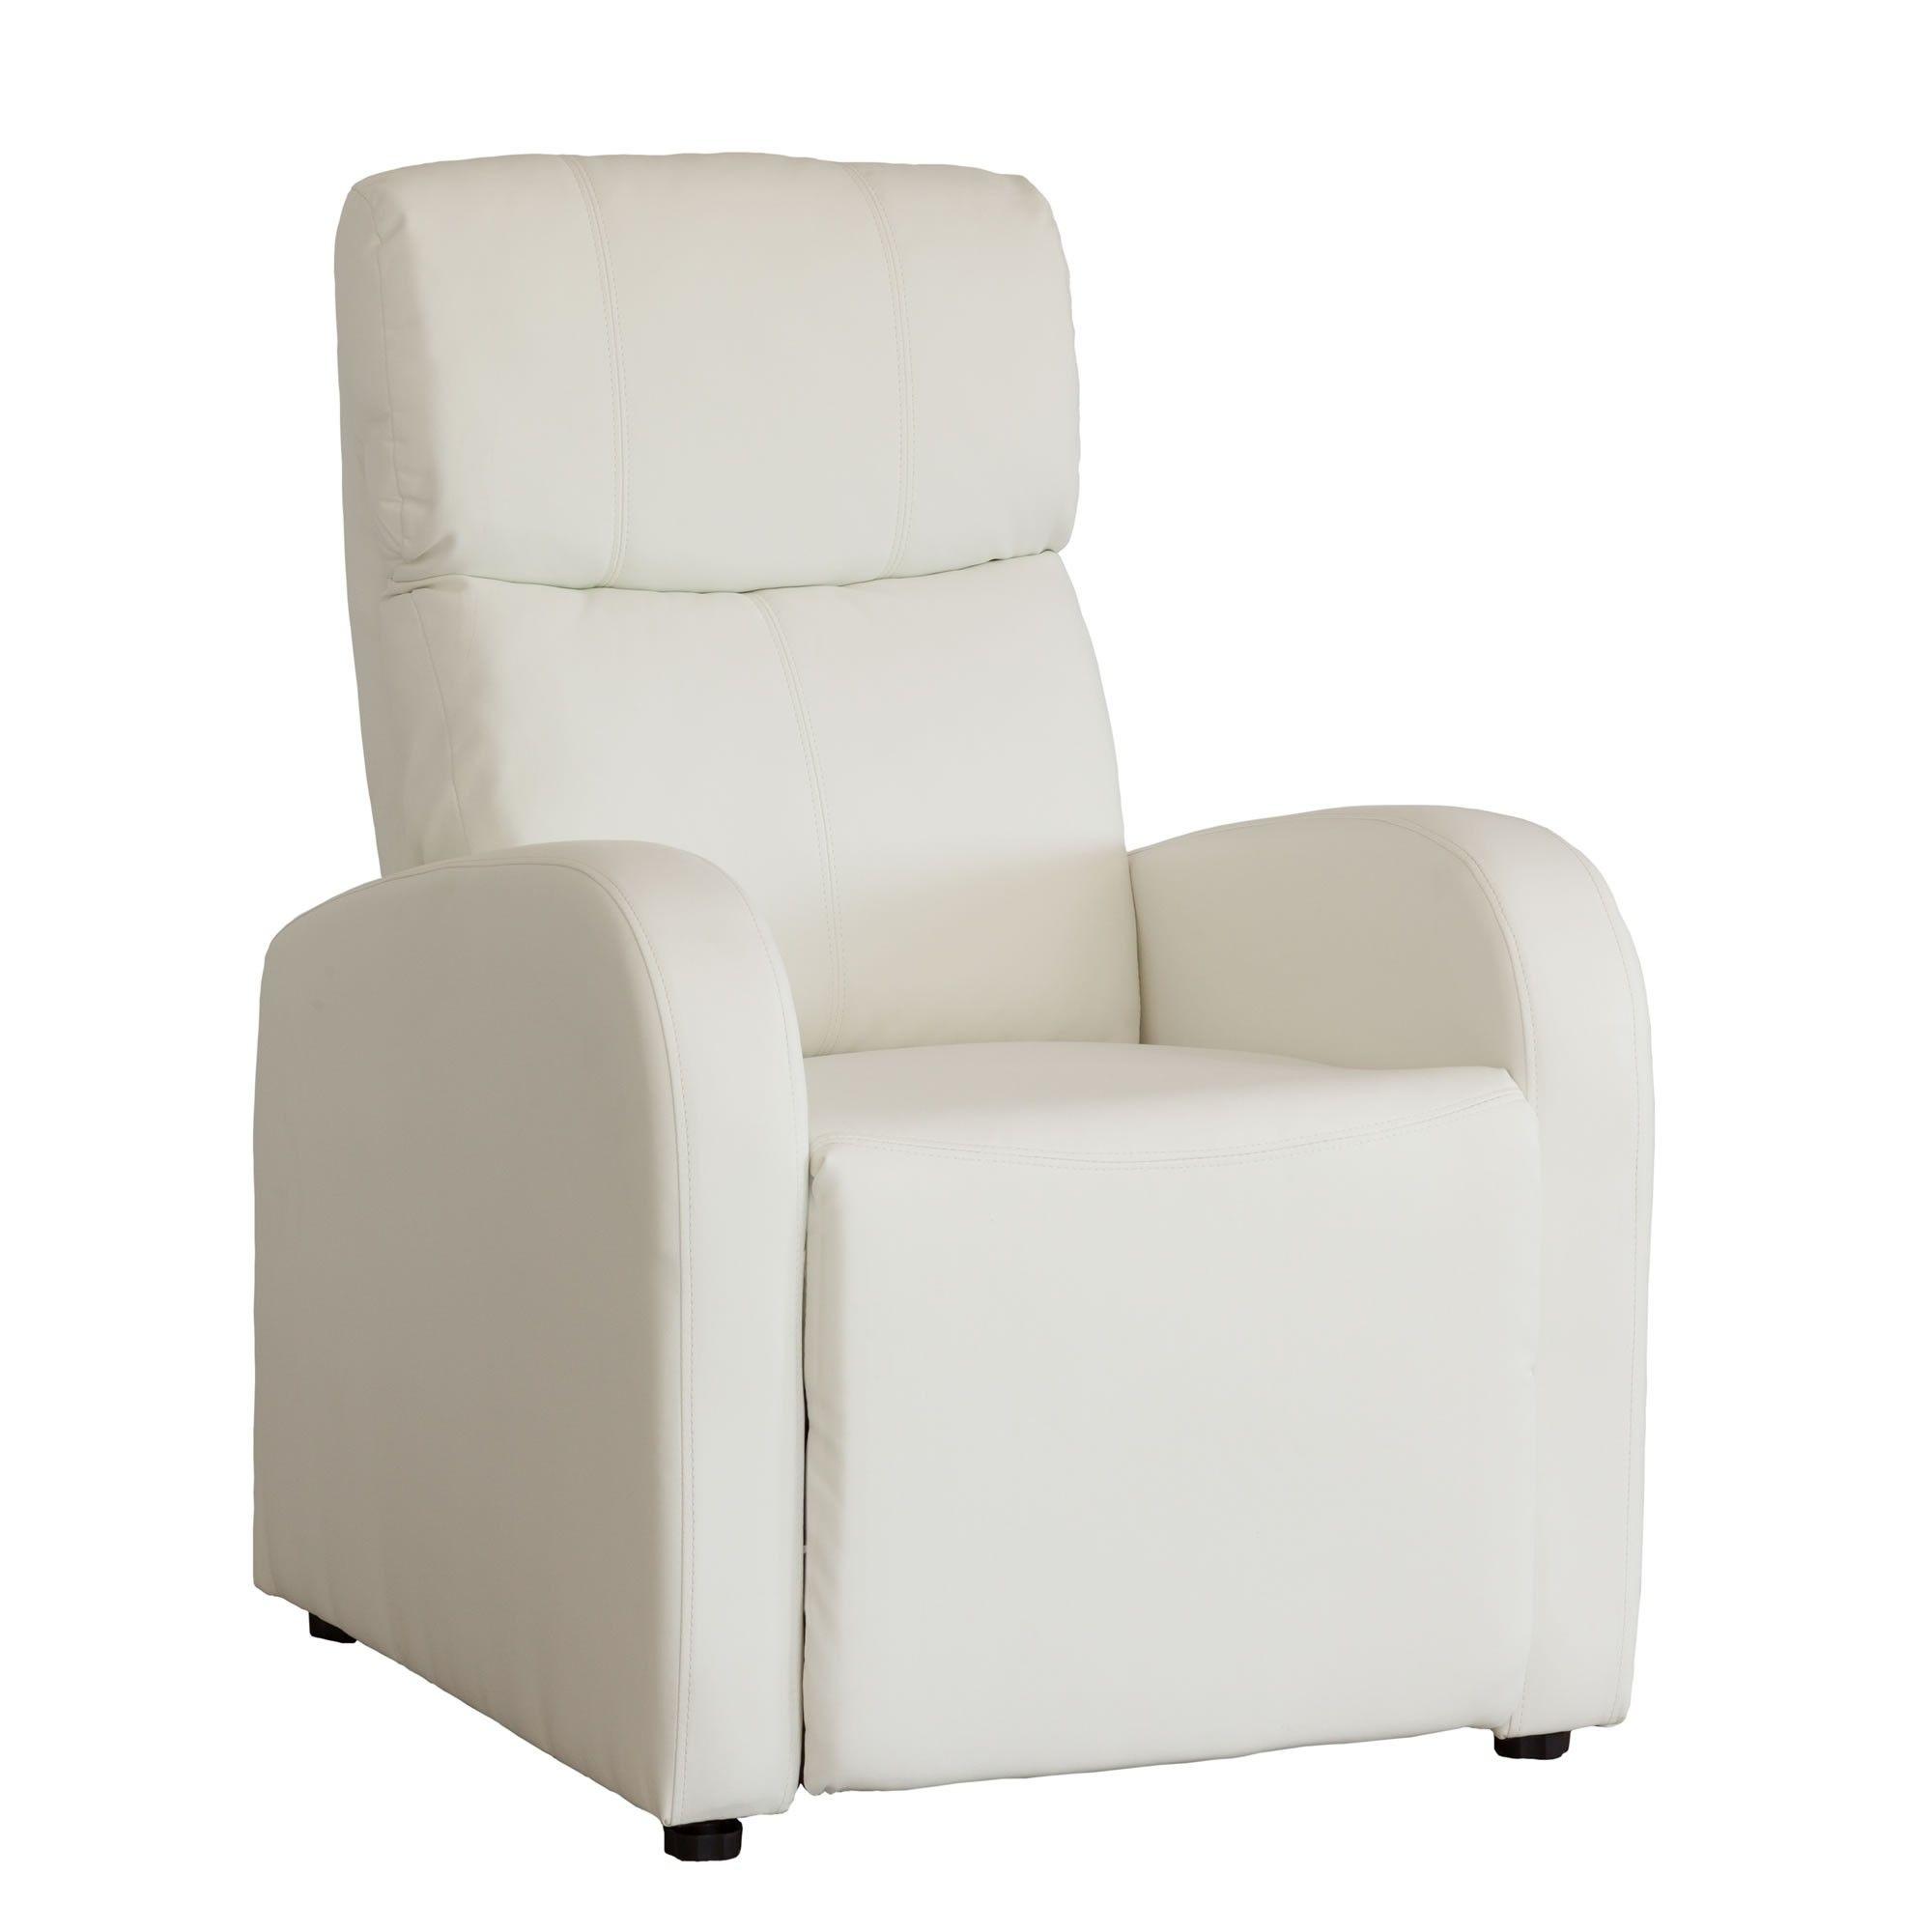 Sillón relax reclinable en simil piel modelo sandra | Reclinable ...